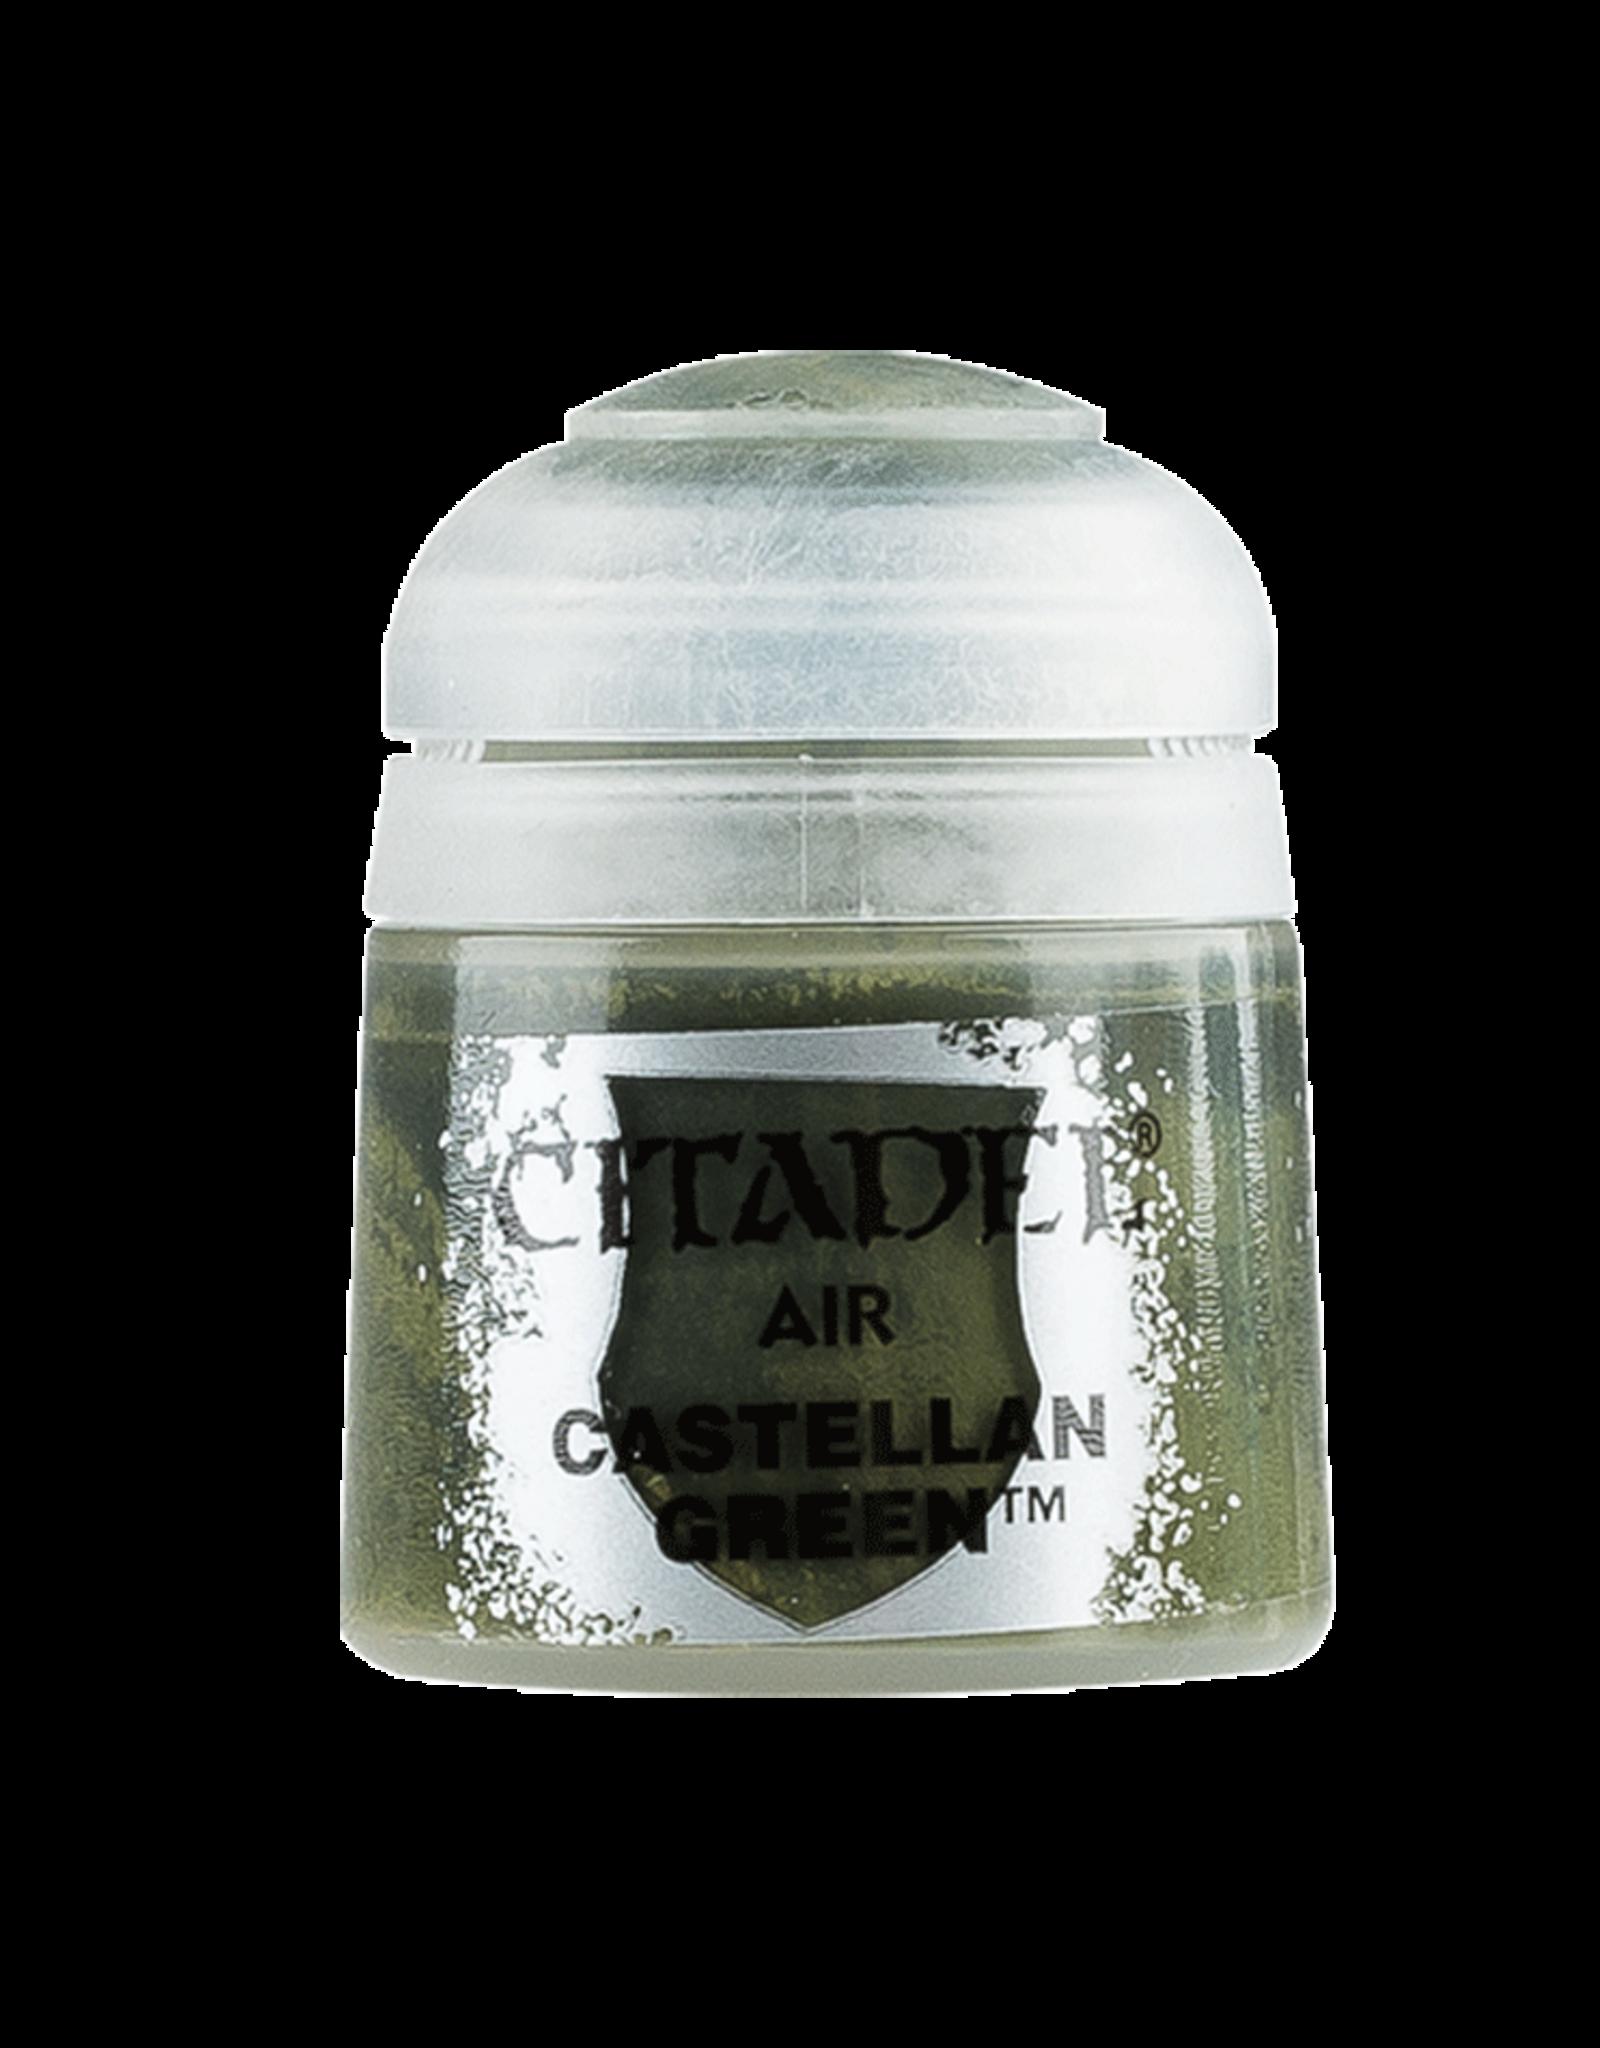 Citadel Citadel Air: Castellan Green (24ml)